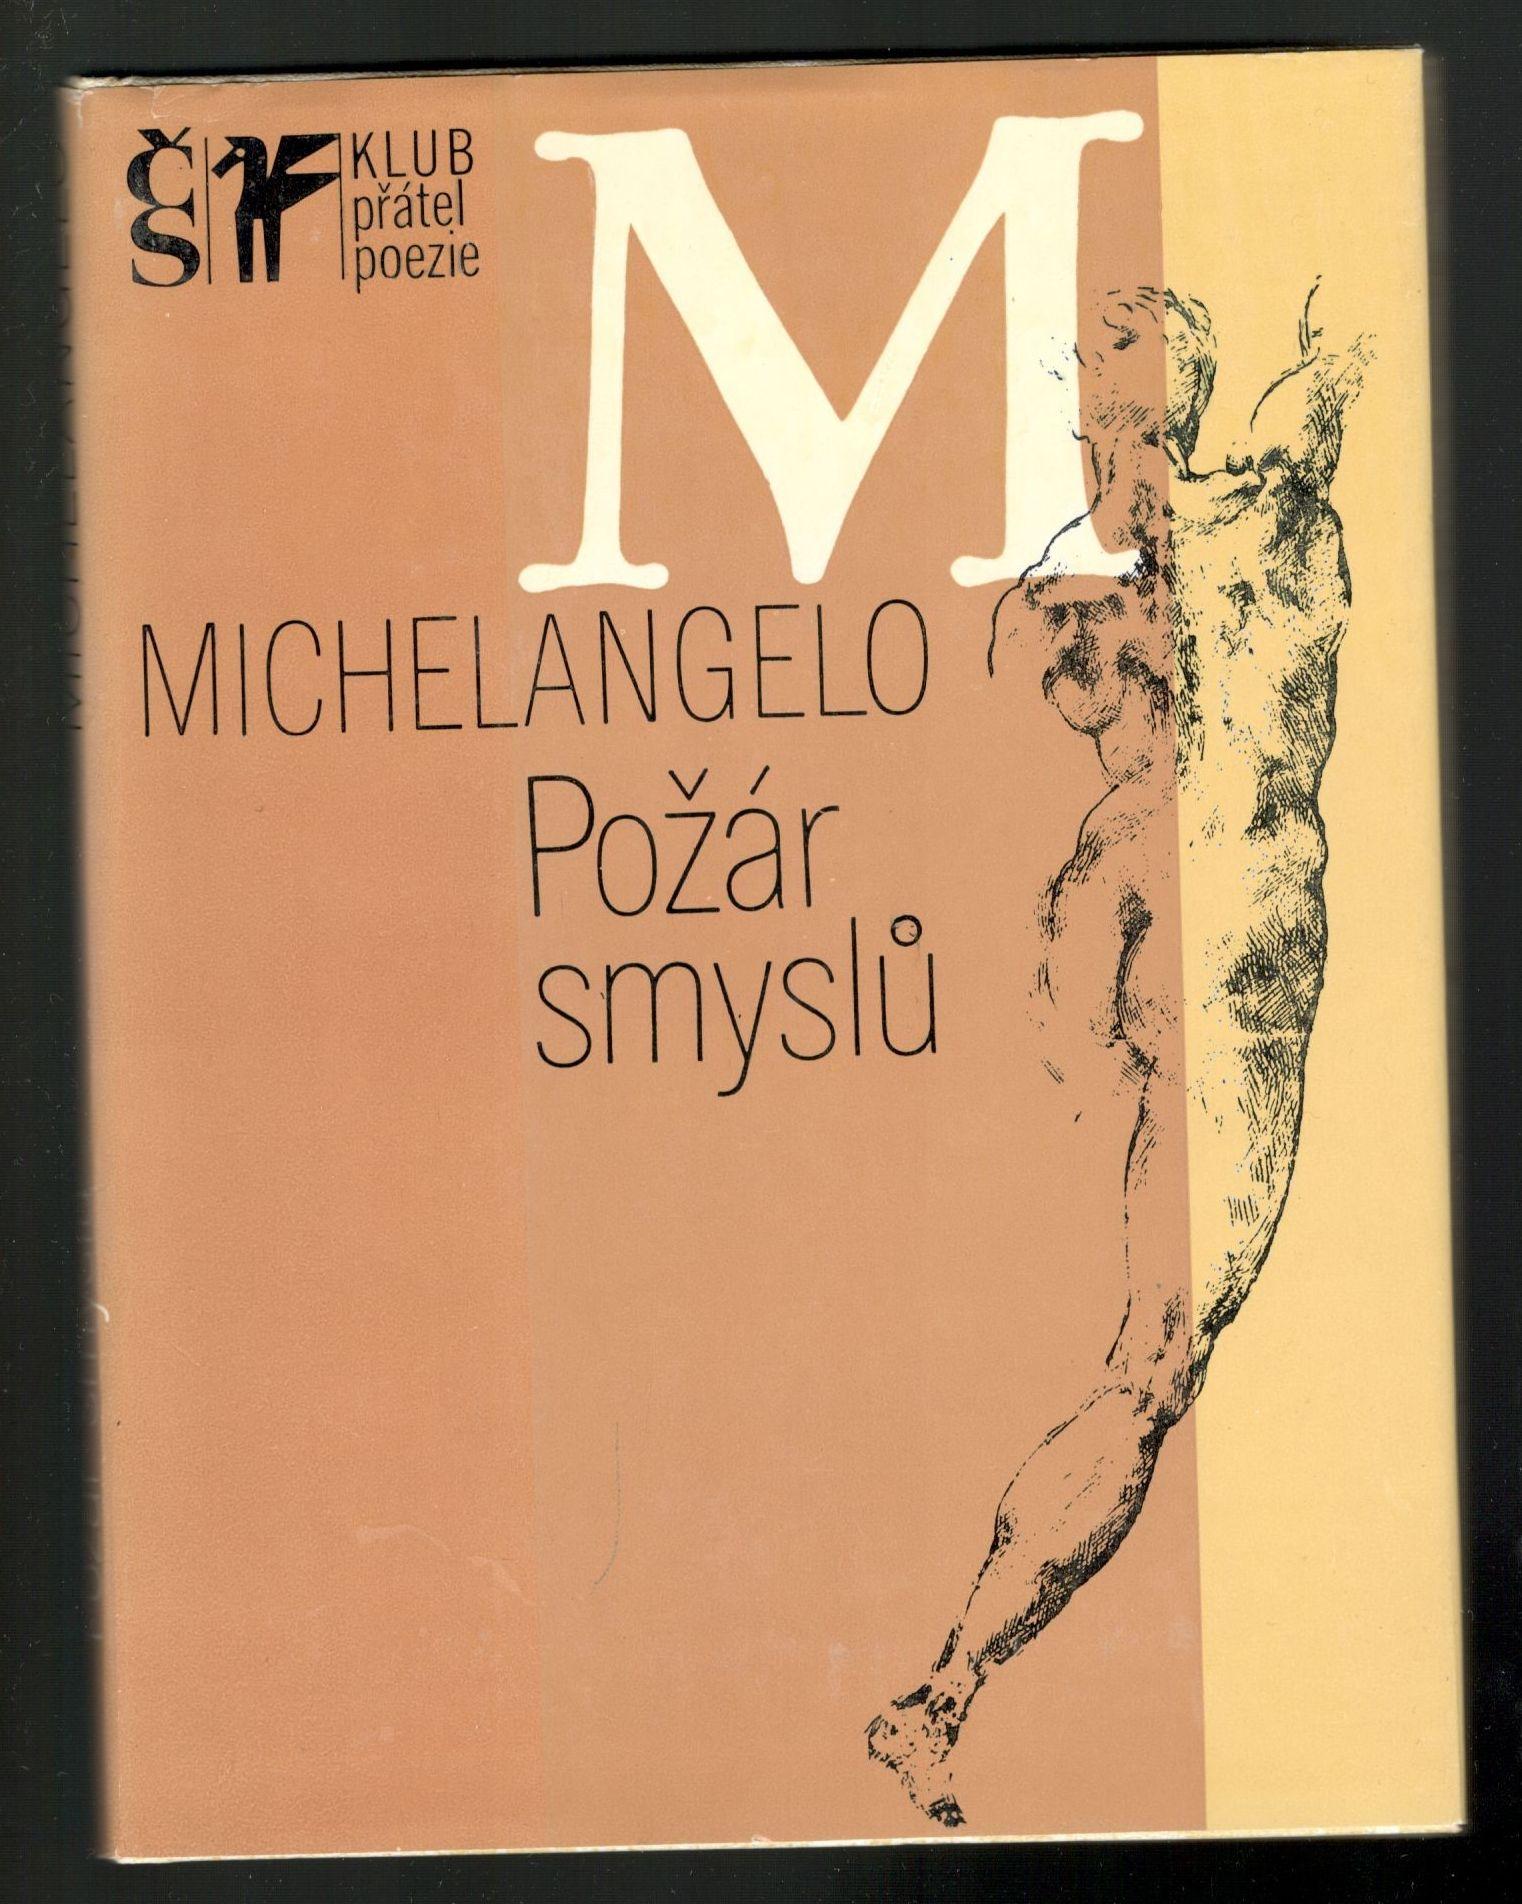 Michelangelo - Požár smyslů - Výbor z poezie a dopisů